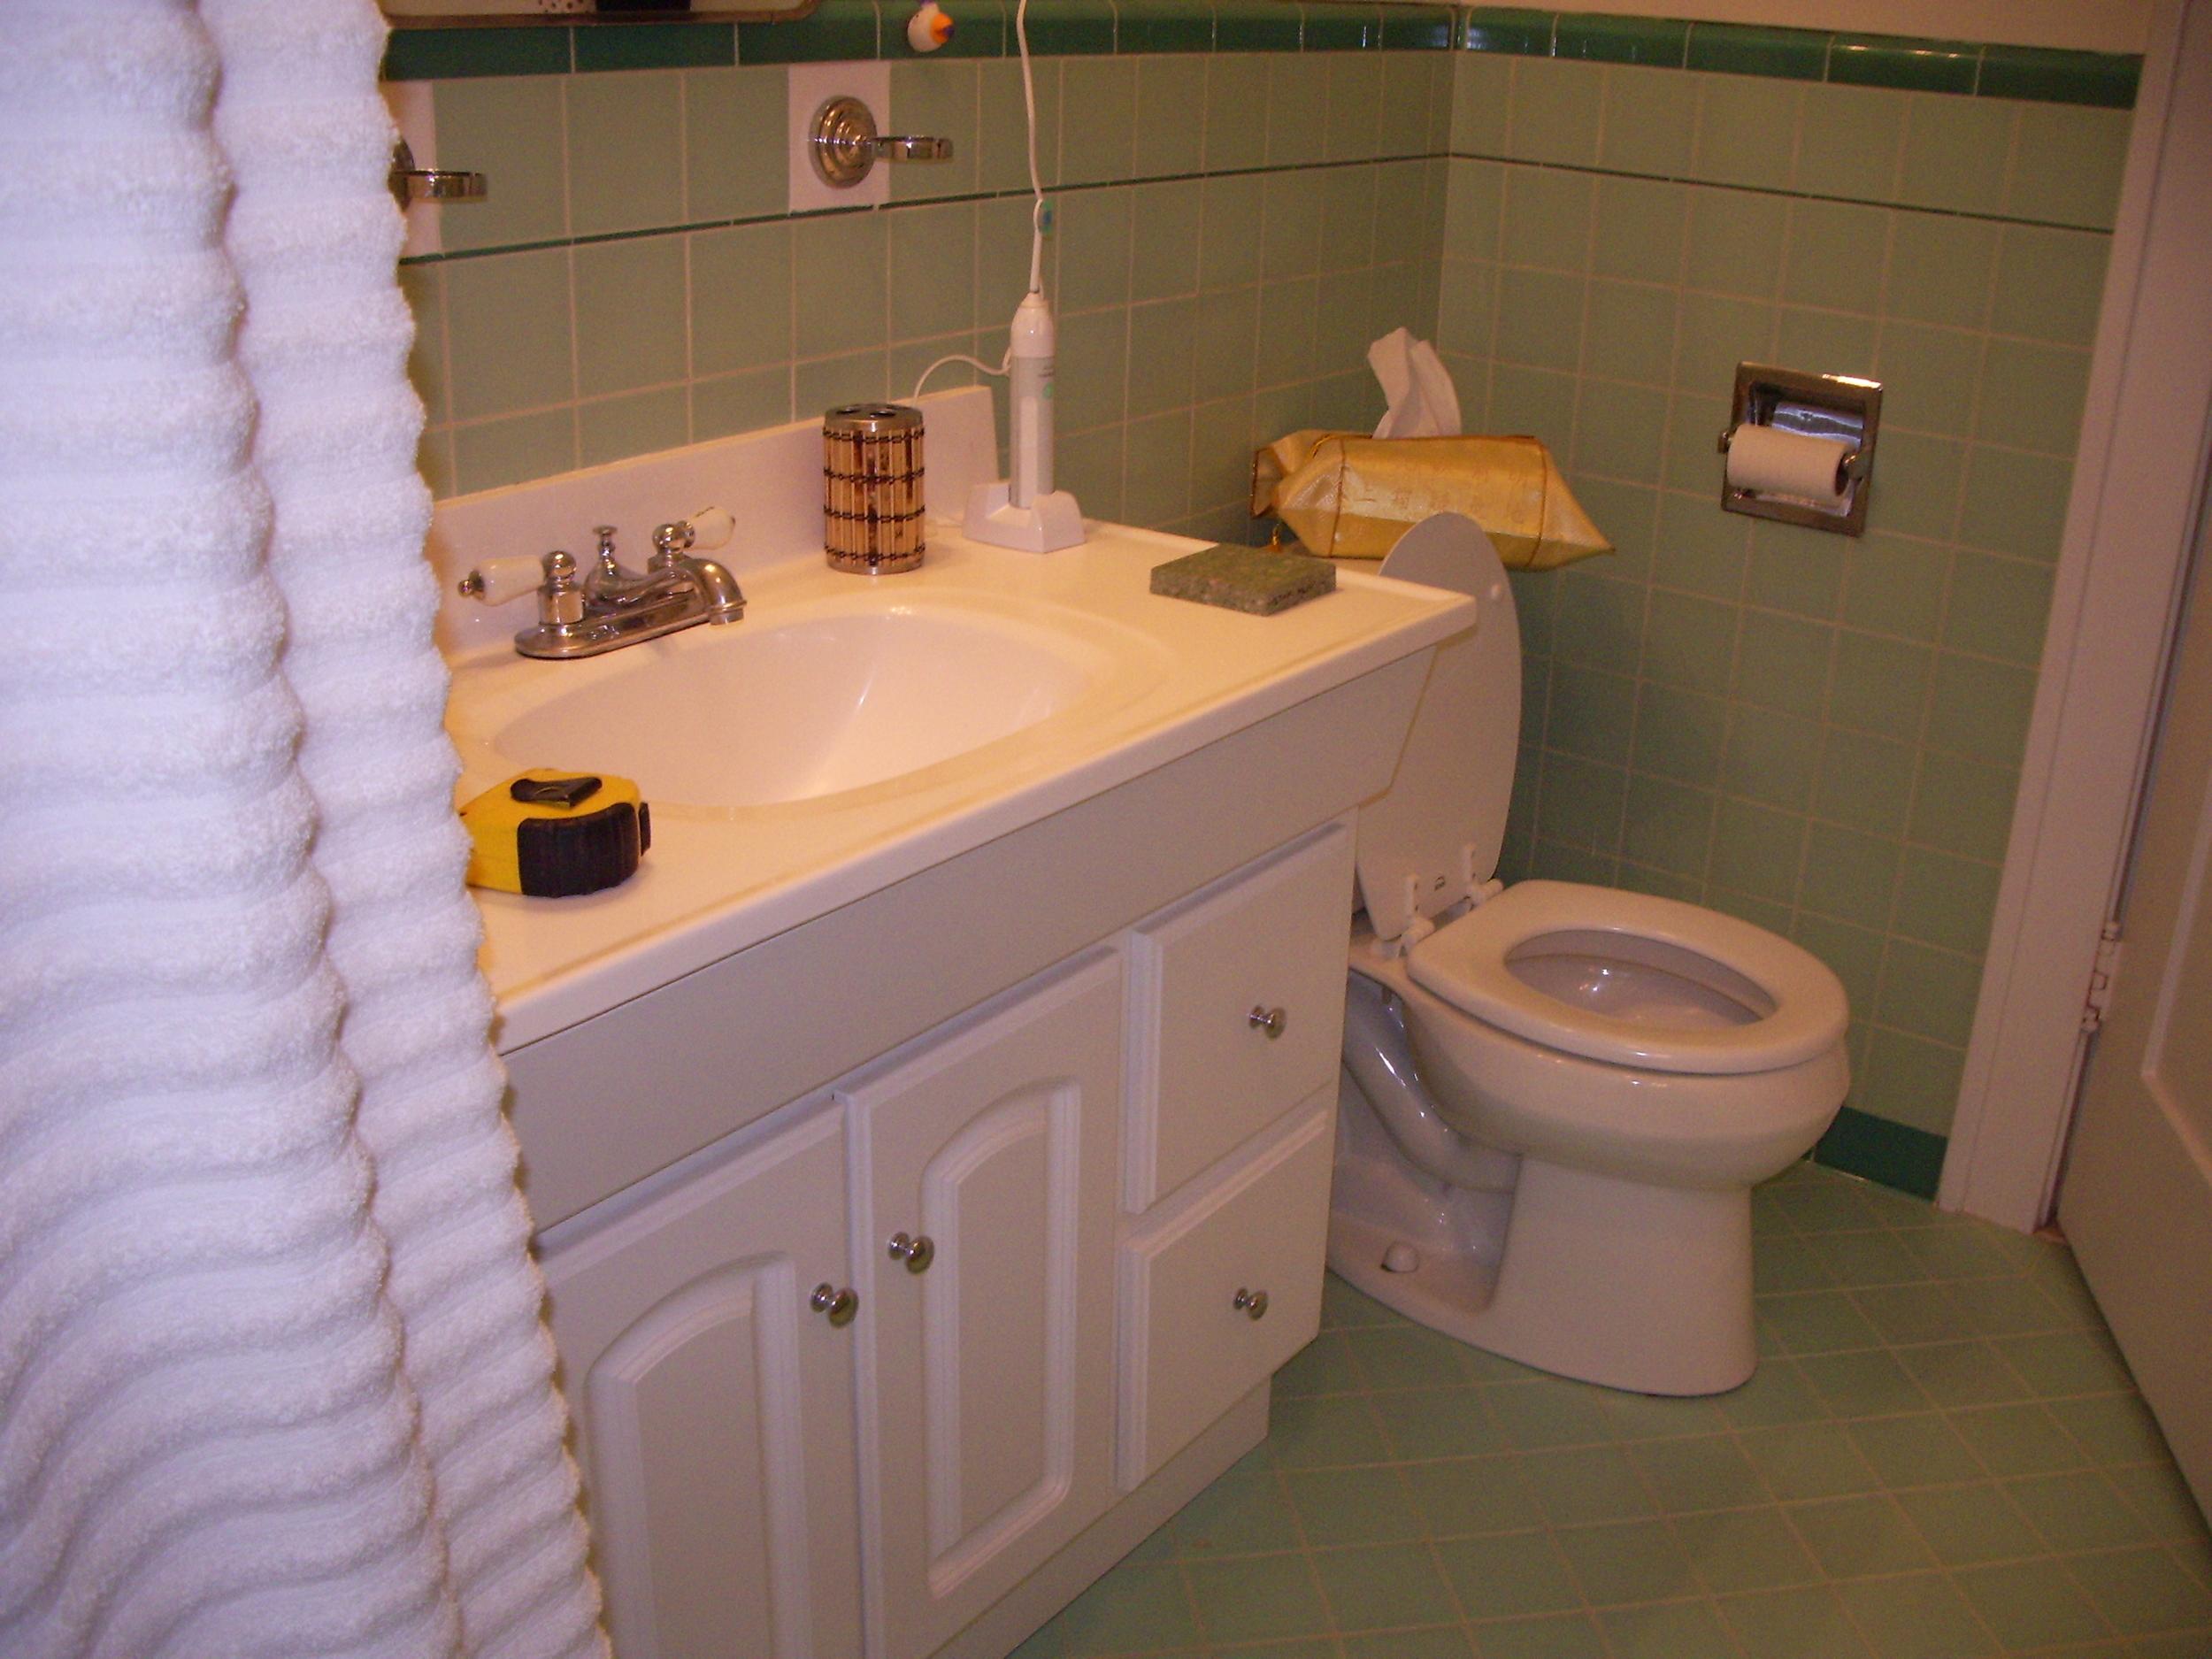 EAB Point Loma Bathroom Remodel 2.JPG